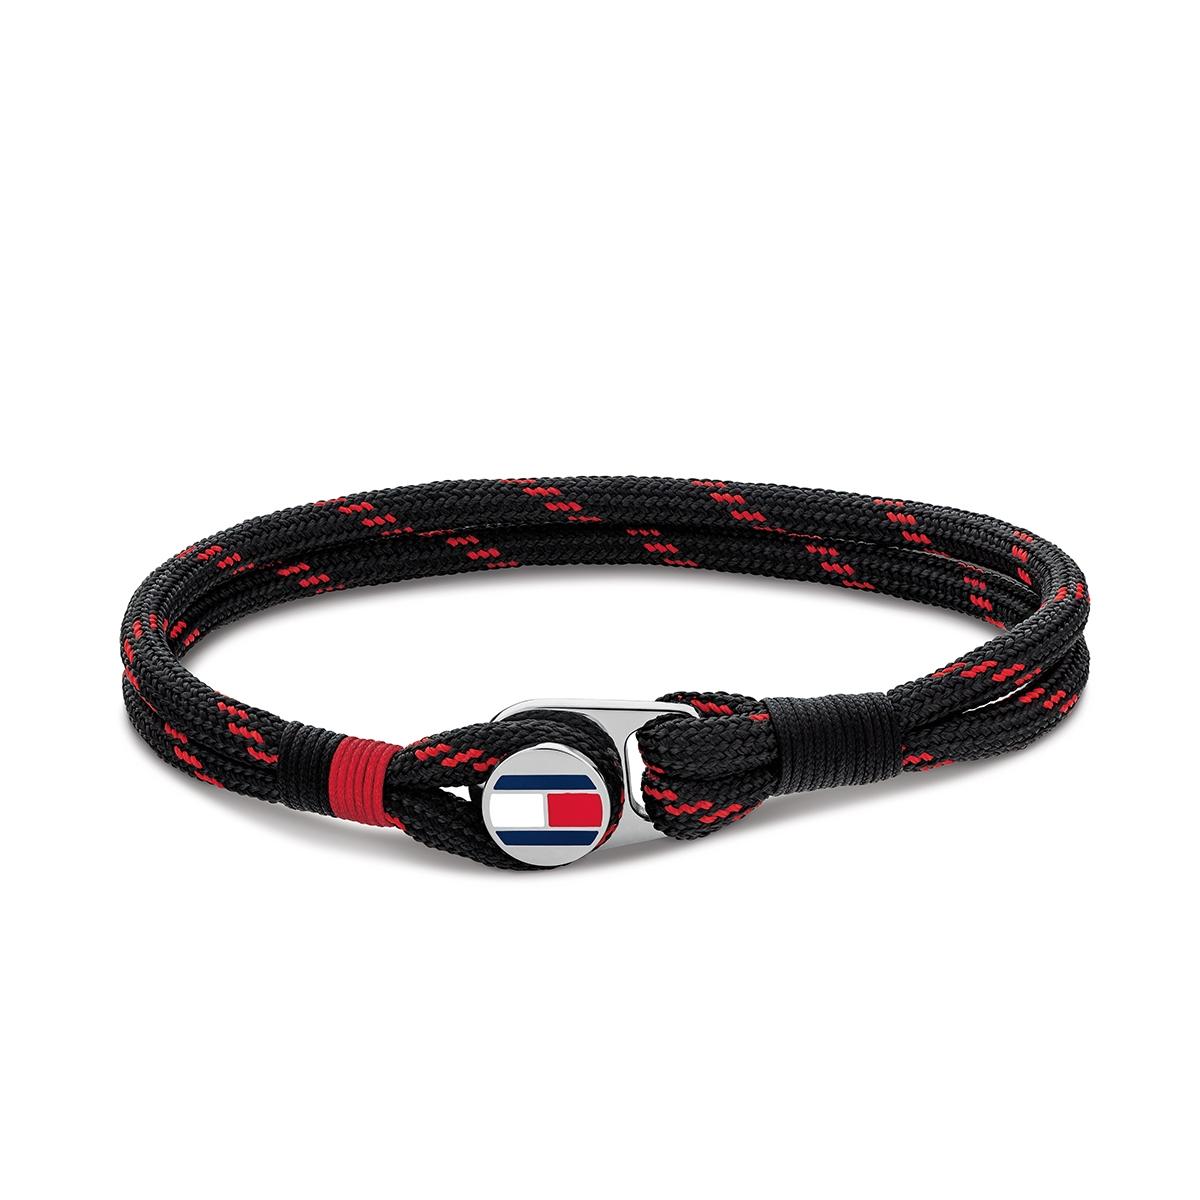 Denim bracelet TJ2790256 - Tommy hilfiger - Modalova